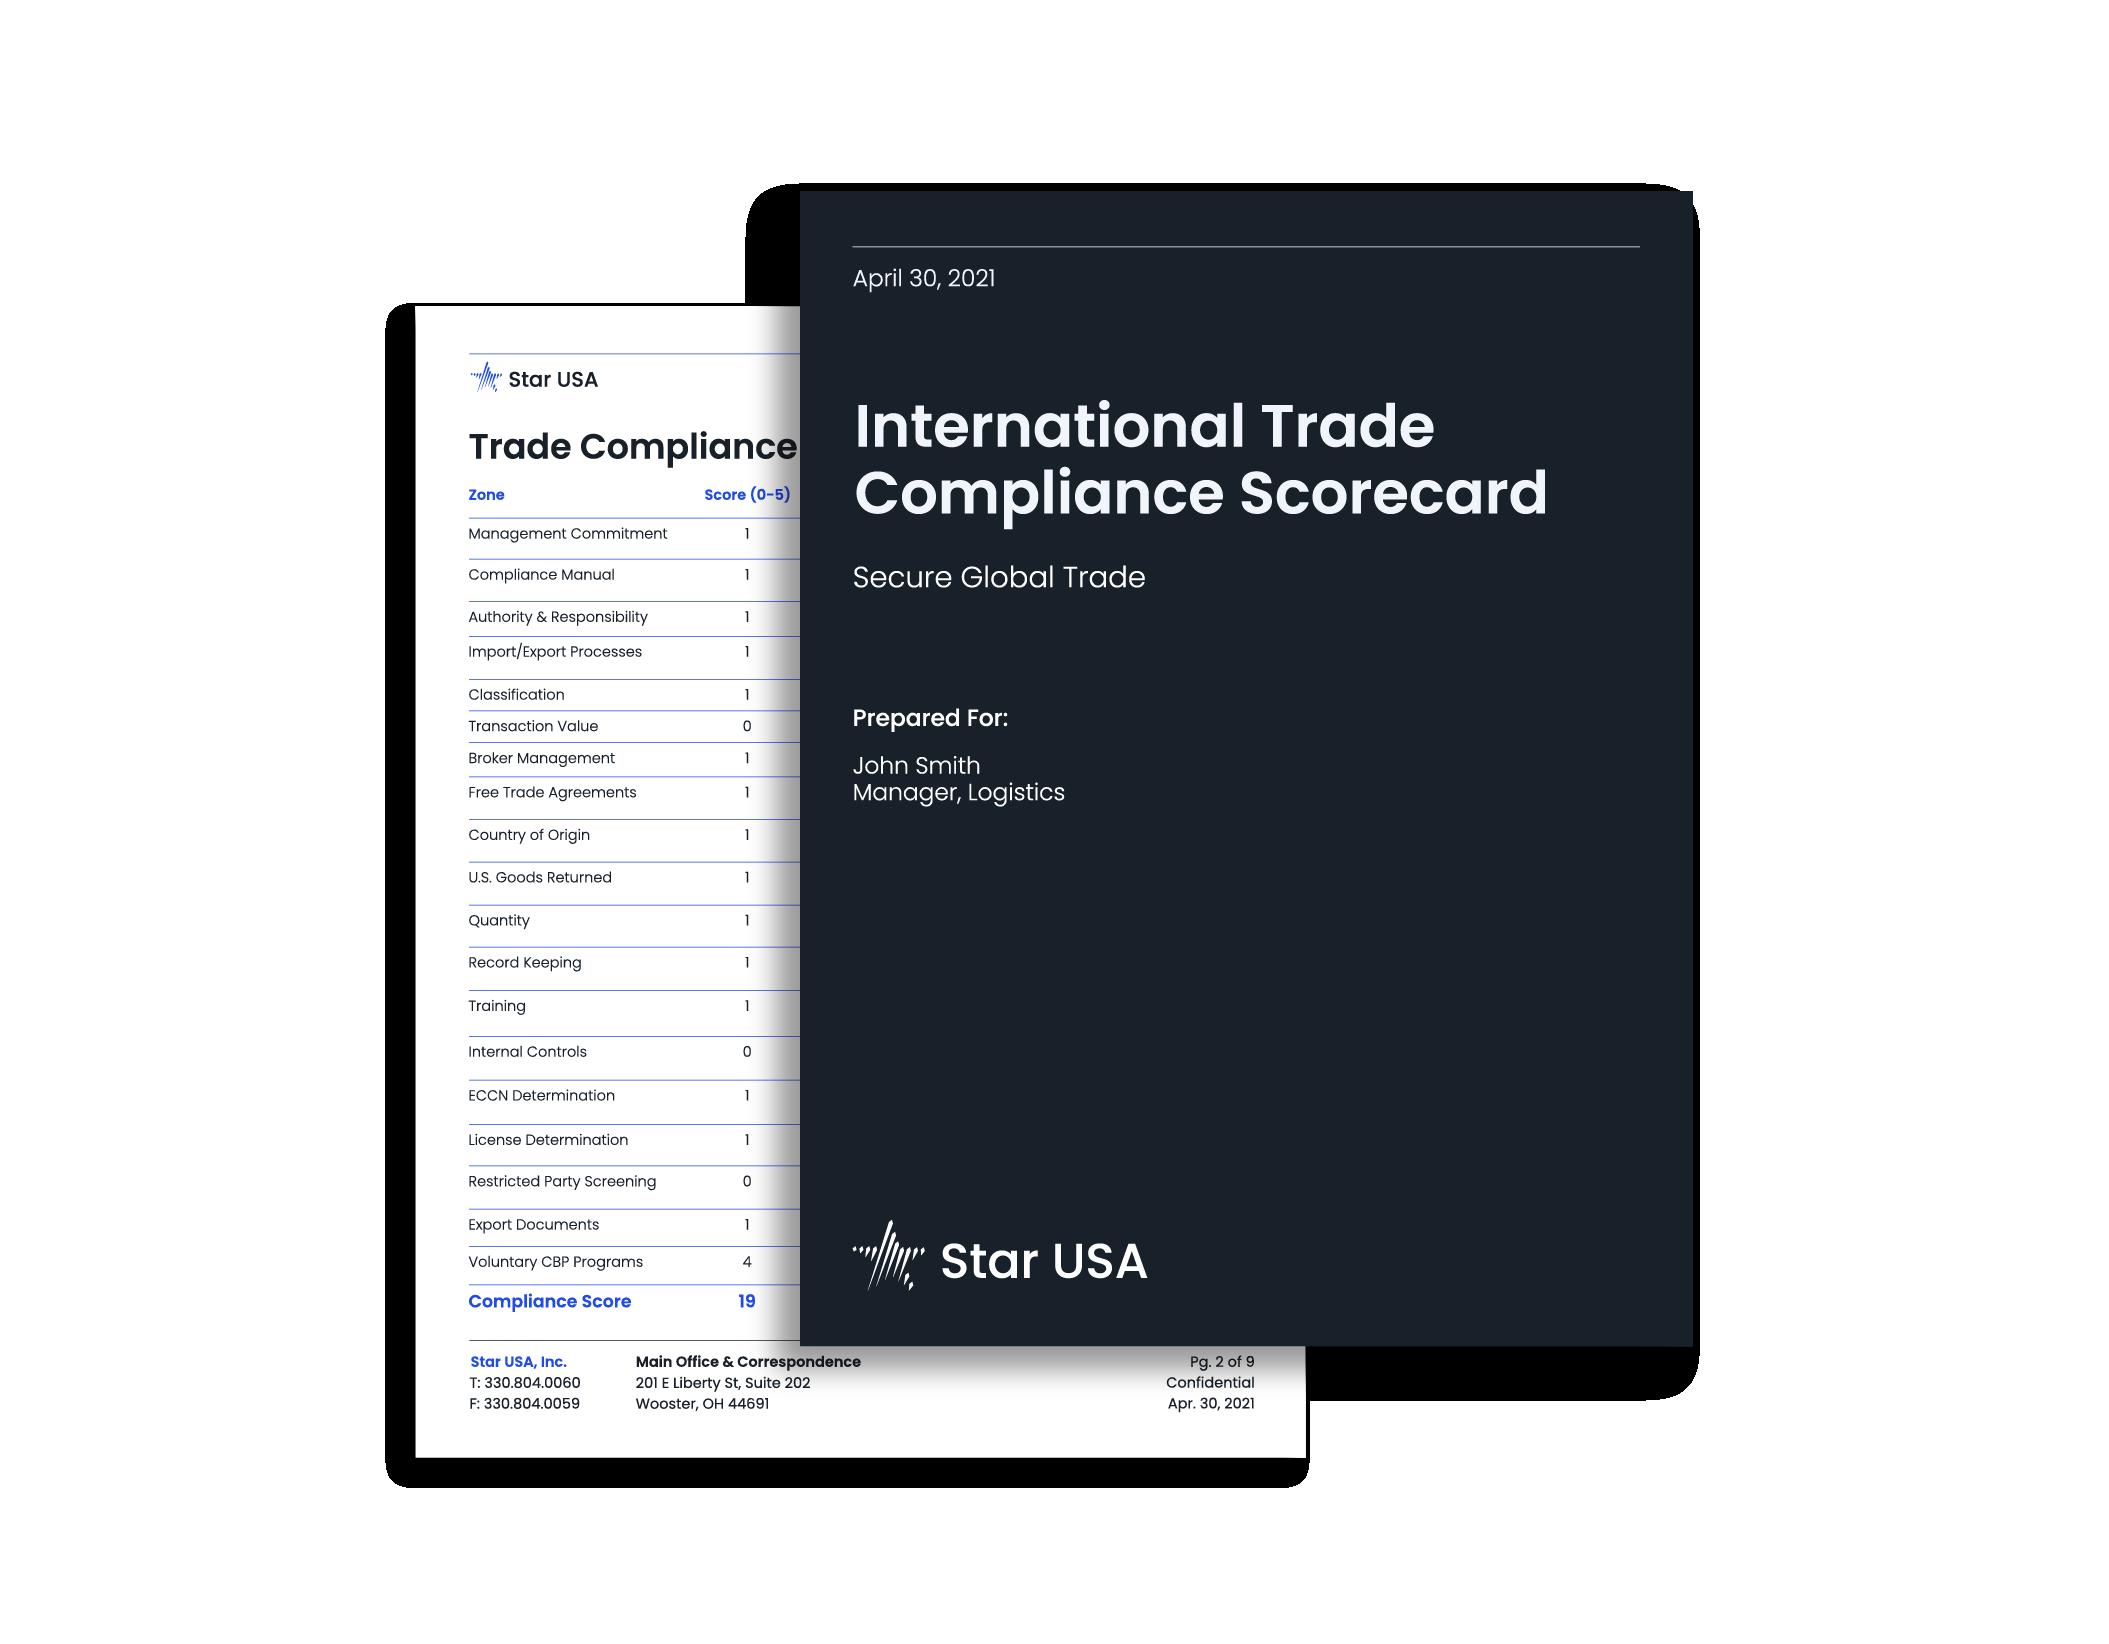 StarUSA-Trade-Compliance-Scorecard-R1-11